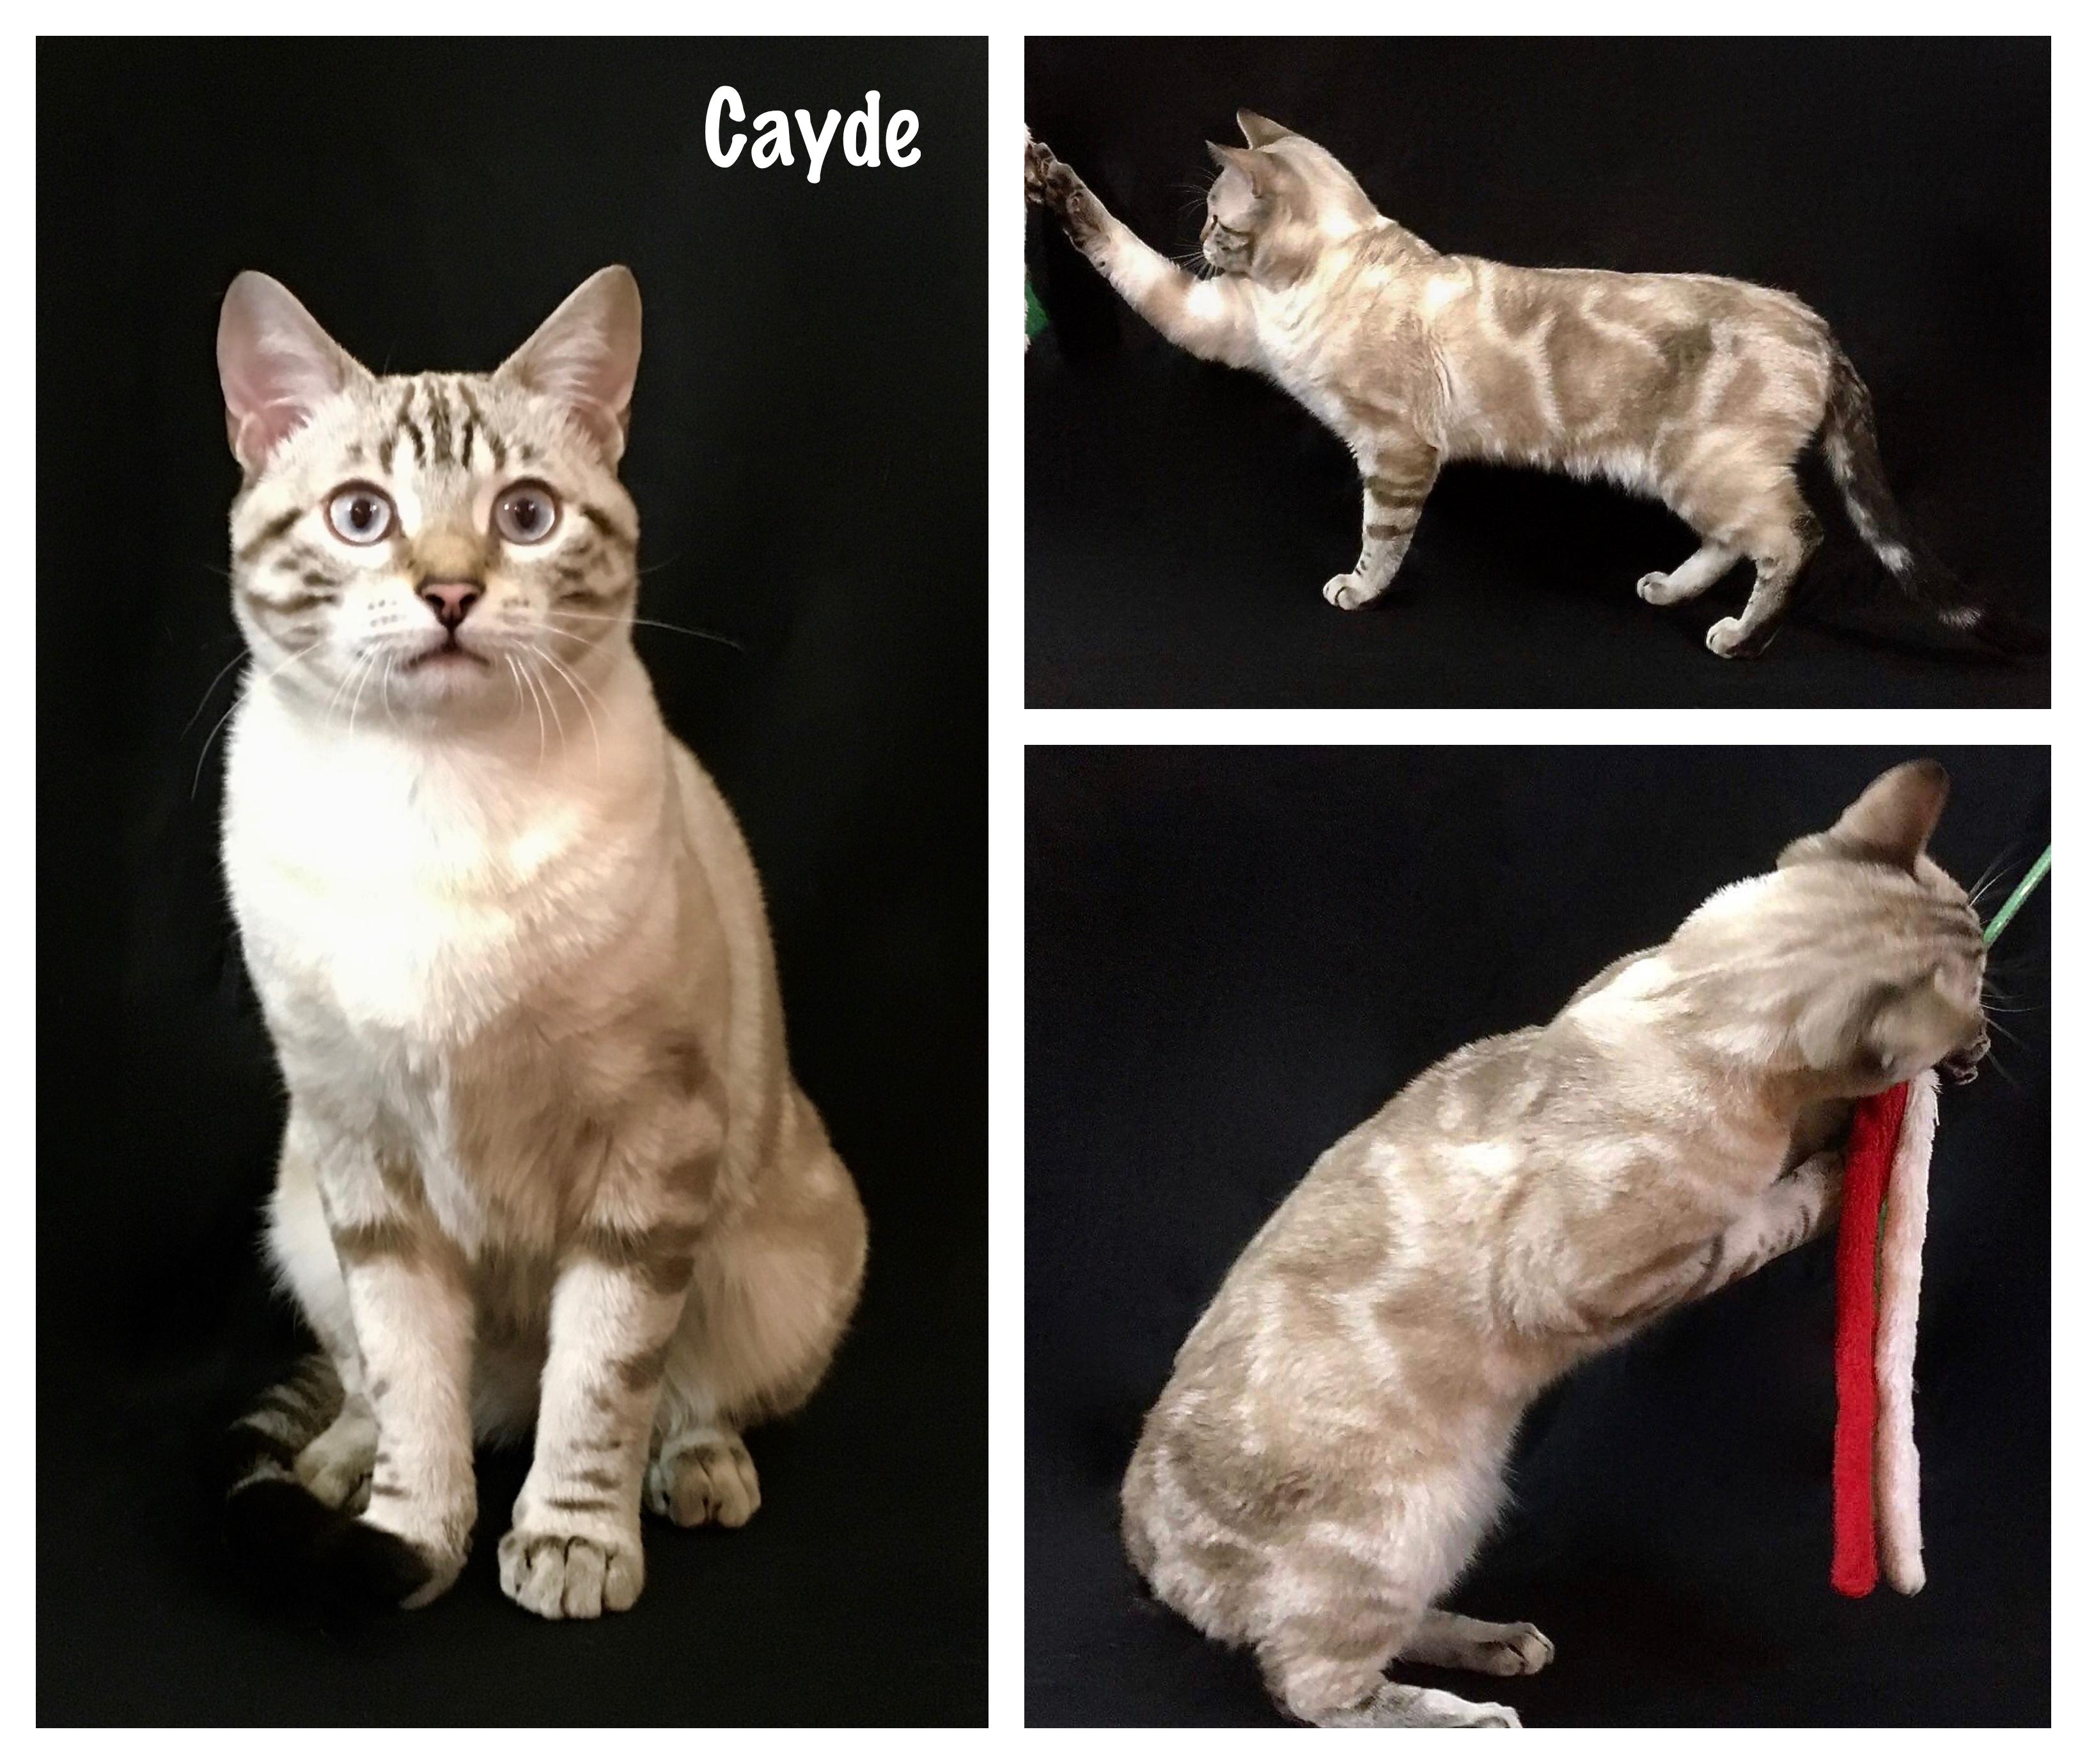 Cayde 22 weeks